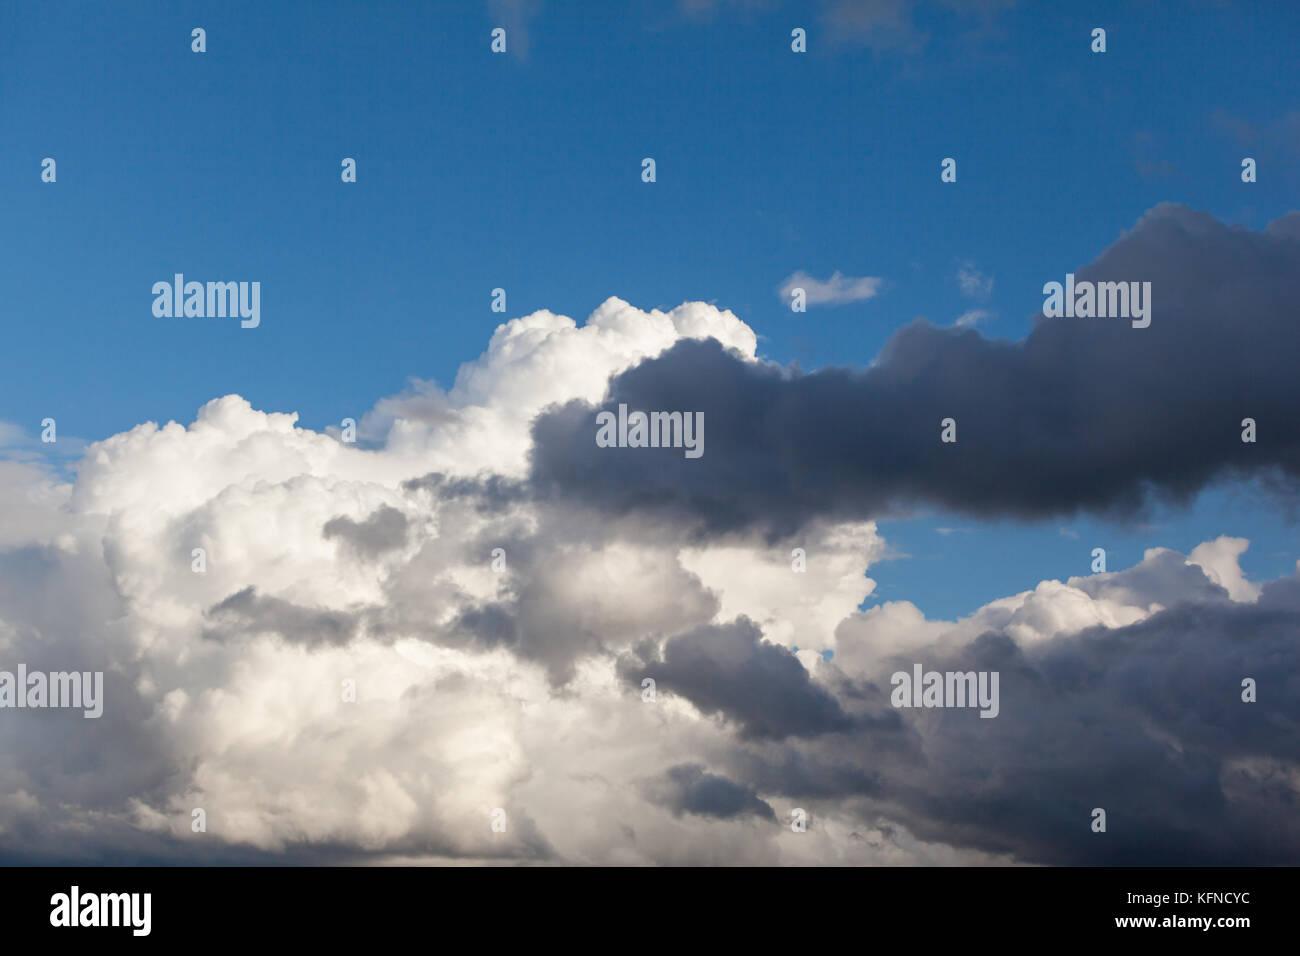 wolke blauer himmel stock photos wolke blauer himmel stock images alamy. Black Bedroom Furniture Sets. Home Design Ideas